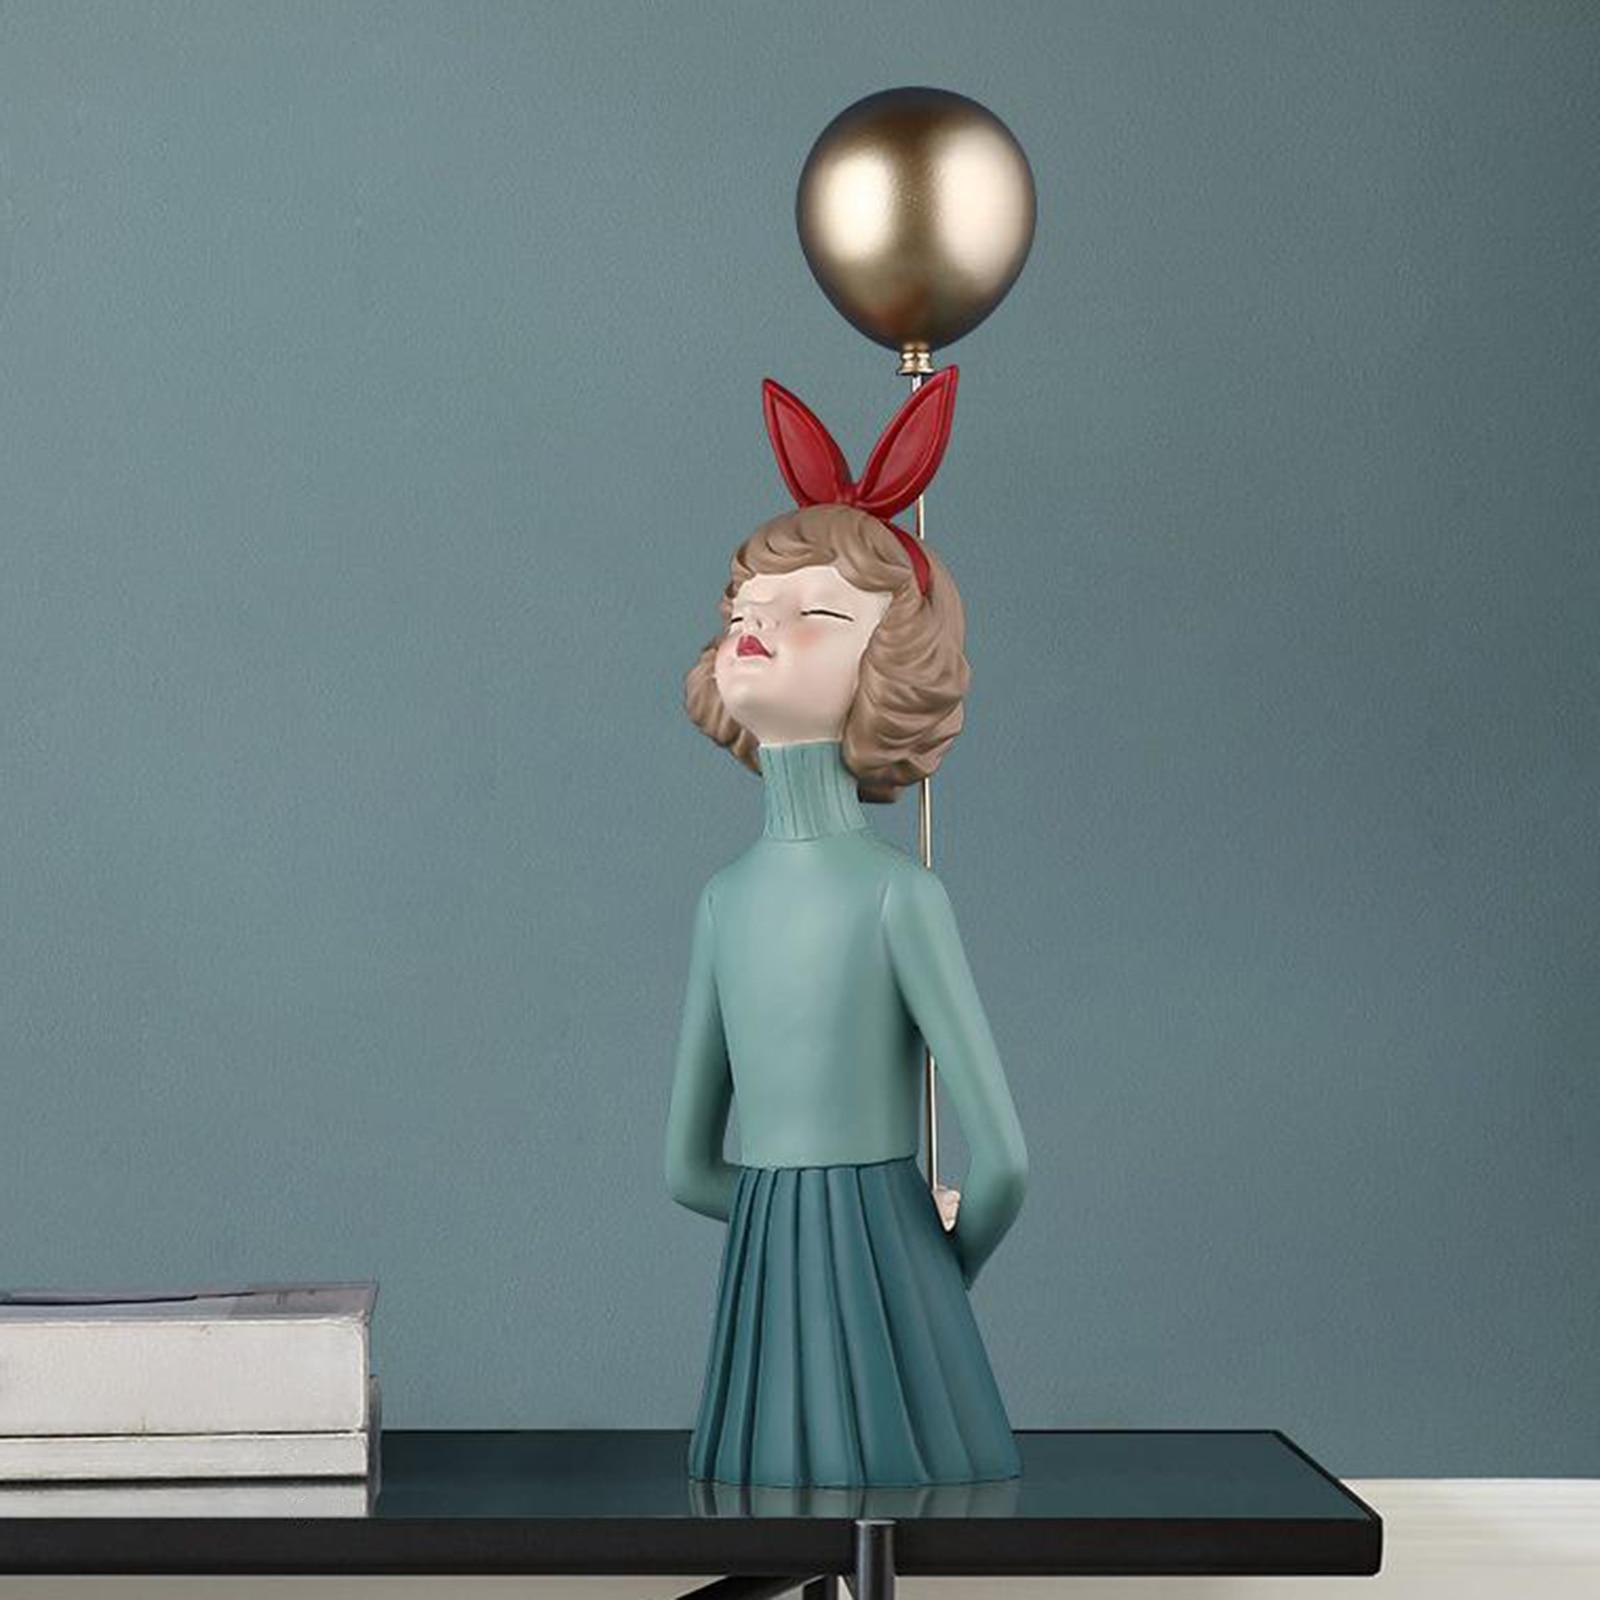 Resina menina moderna estatueta desktop ornamento prateleira